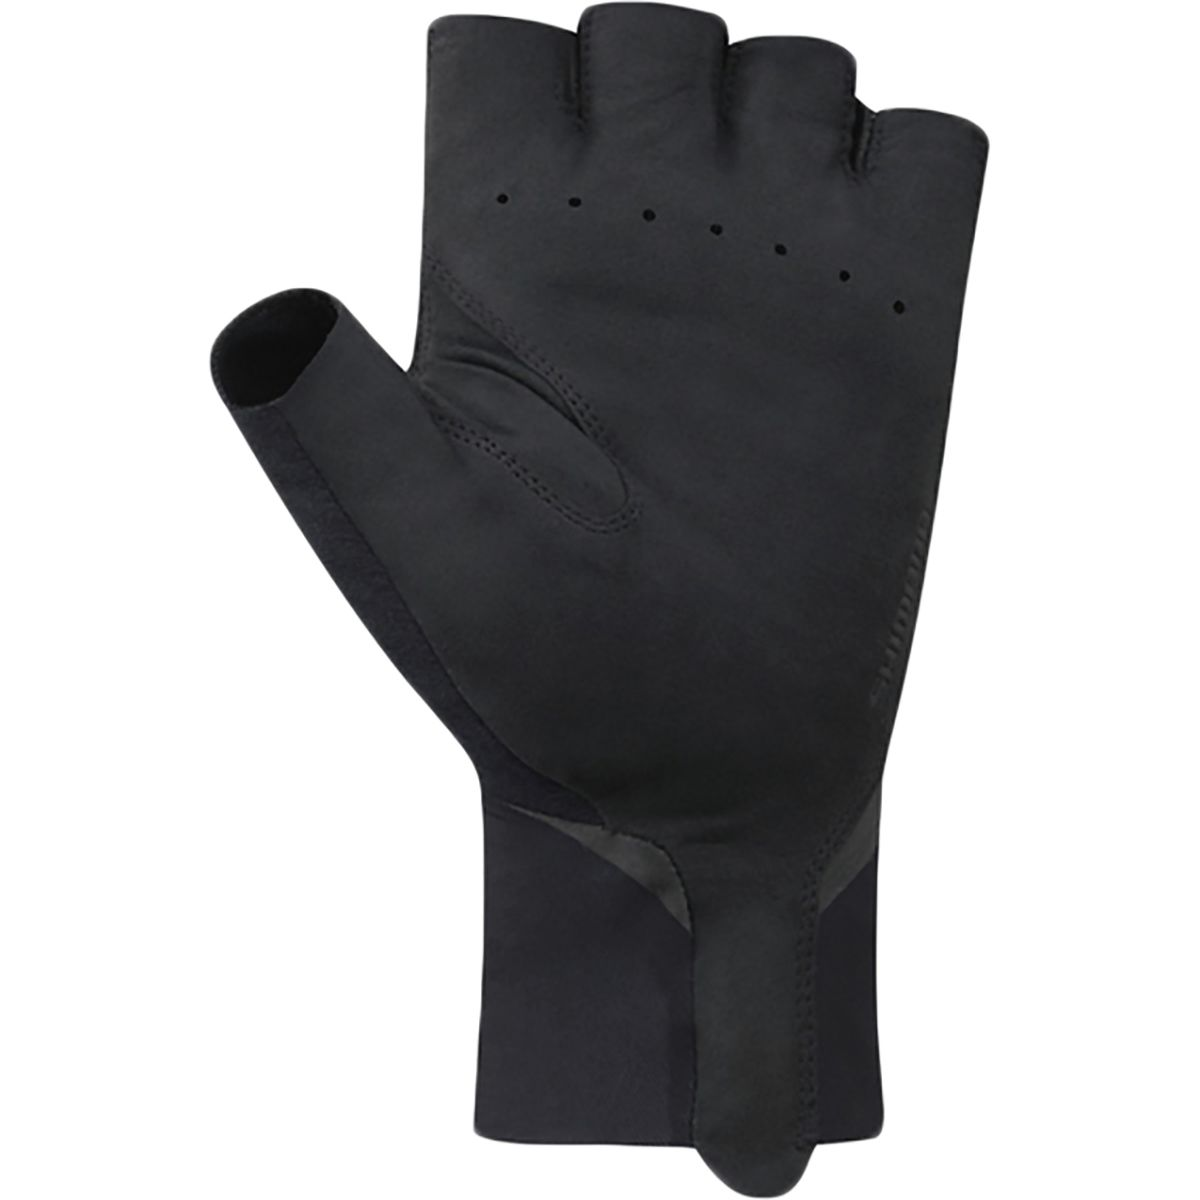 Shimano-S-PHYRE-Glove-Men-039-s miniature 4